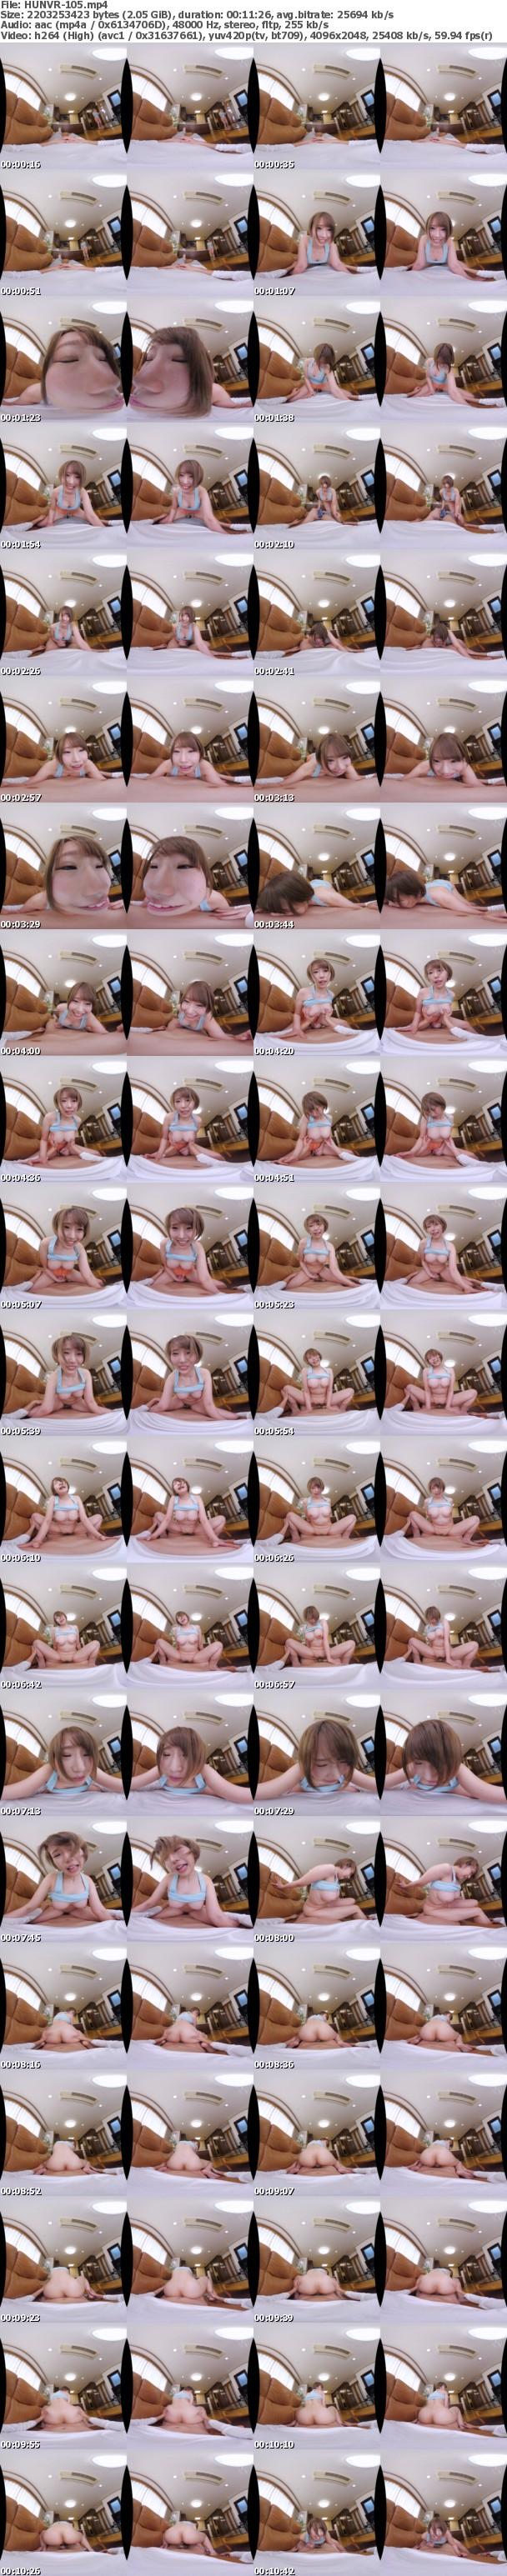 (VR) HUNVR-105 忙しいひとのための約10分で抜けるVR!!父と母が不在の時にエッチを誘ってくる巨乳姉編